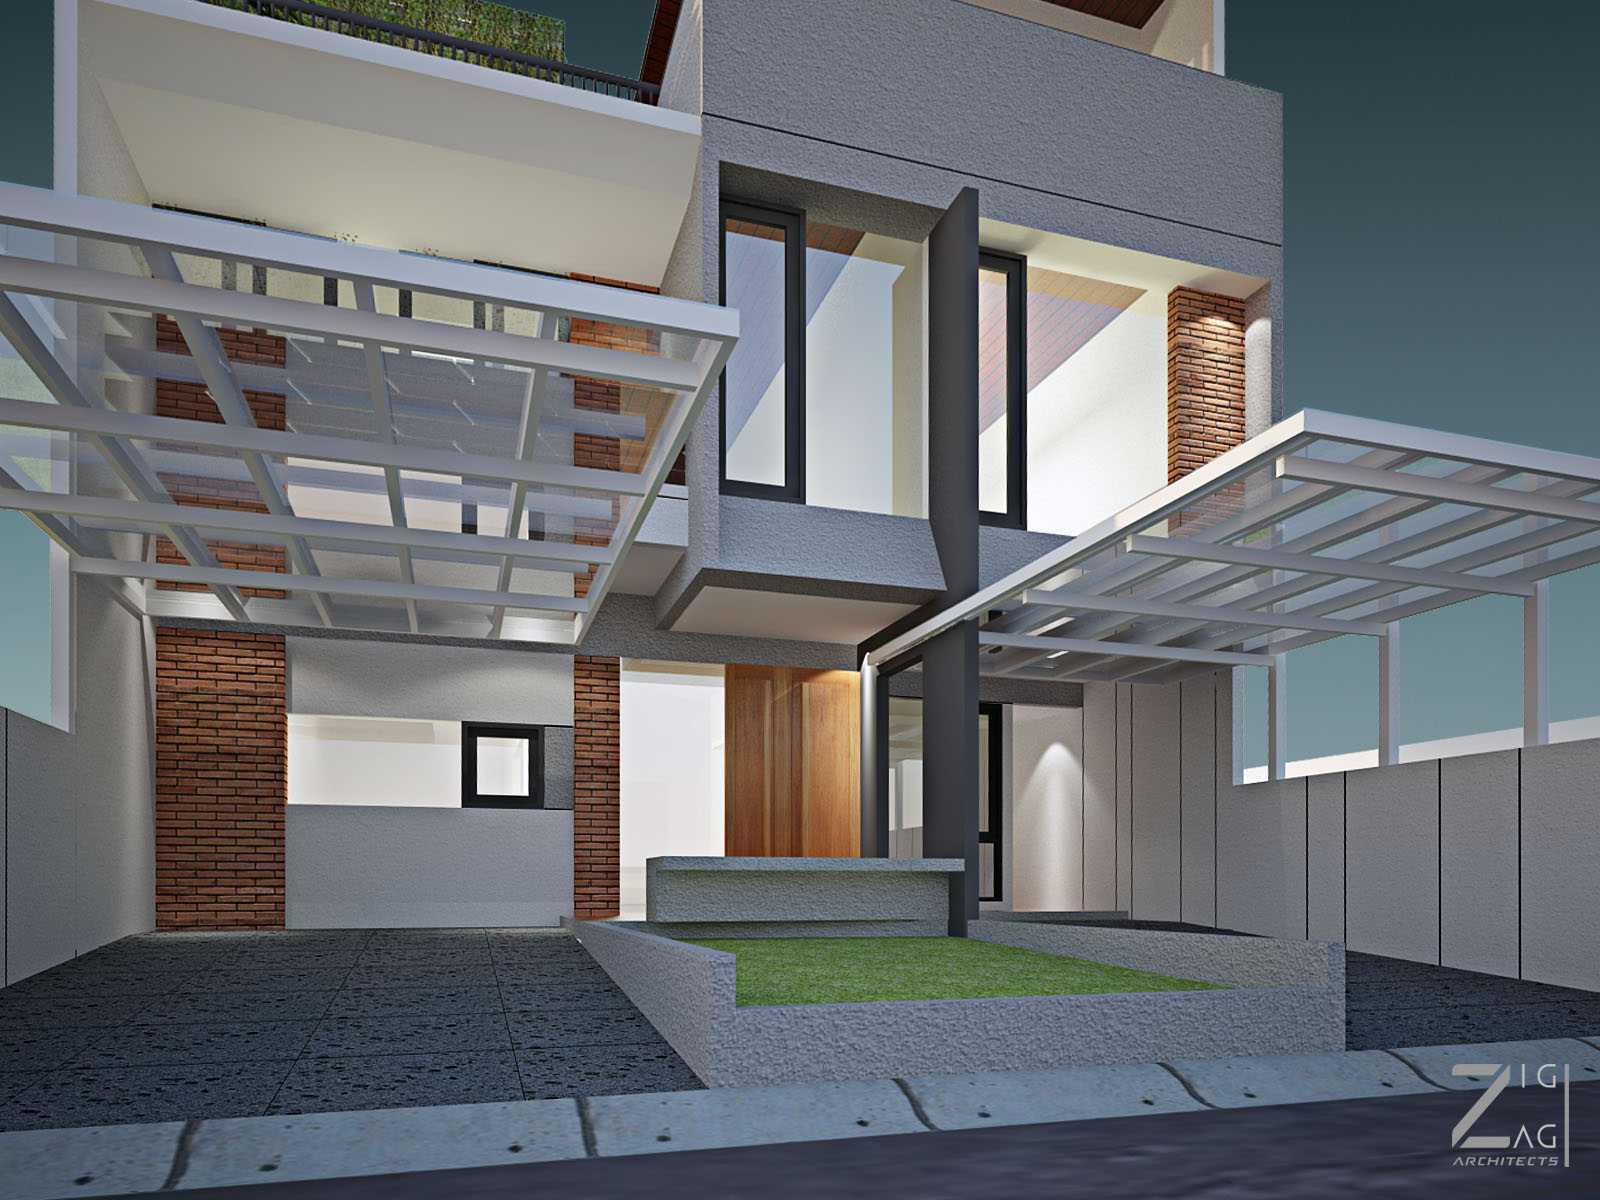 Zigzag Architecture Studio Pulomas House Daerah Khusus Ibukota Jakarta, Indonesia  02   37596